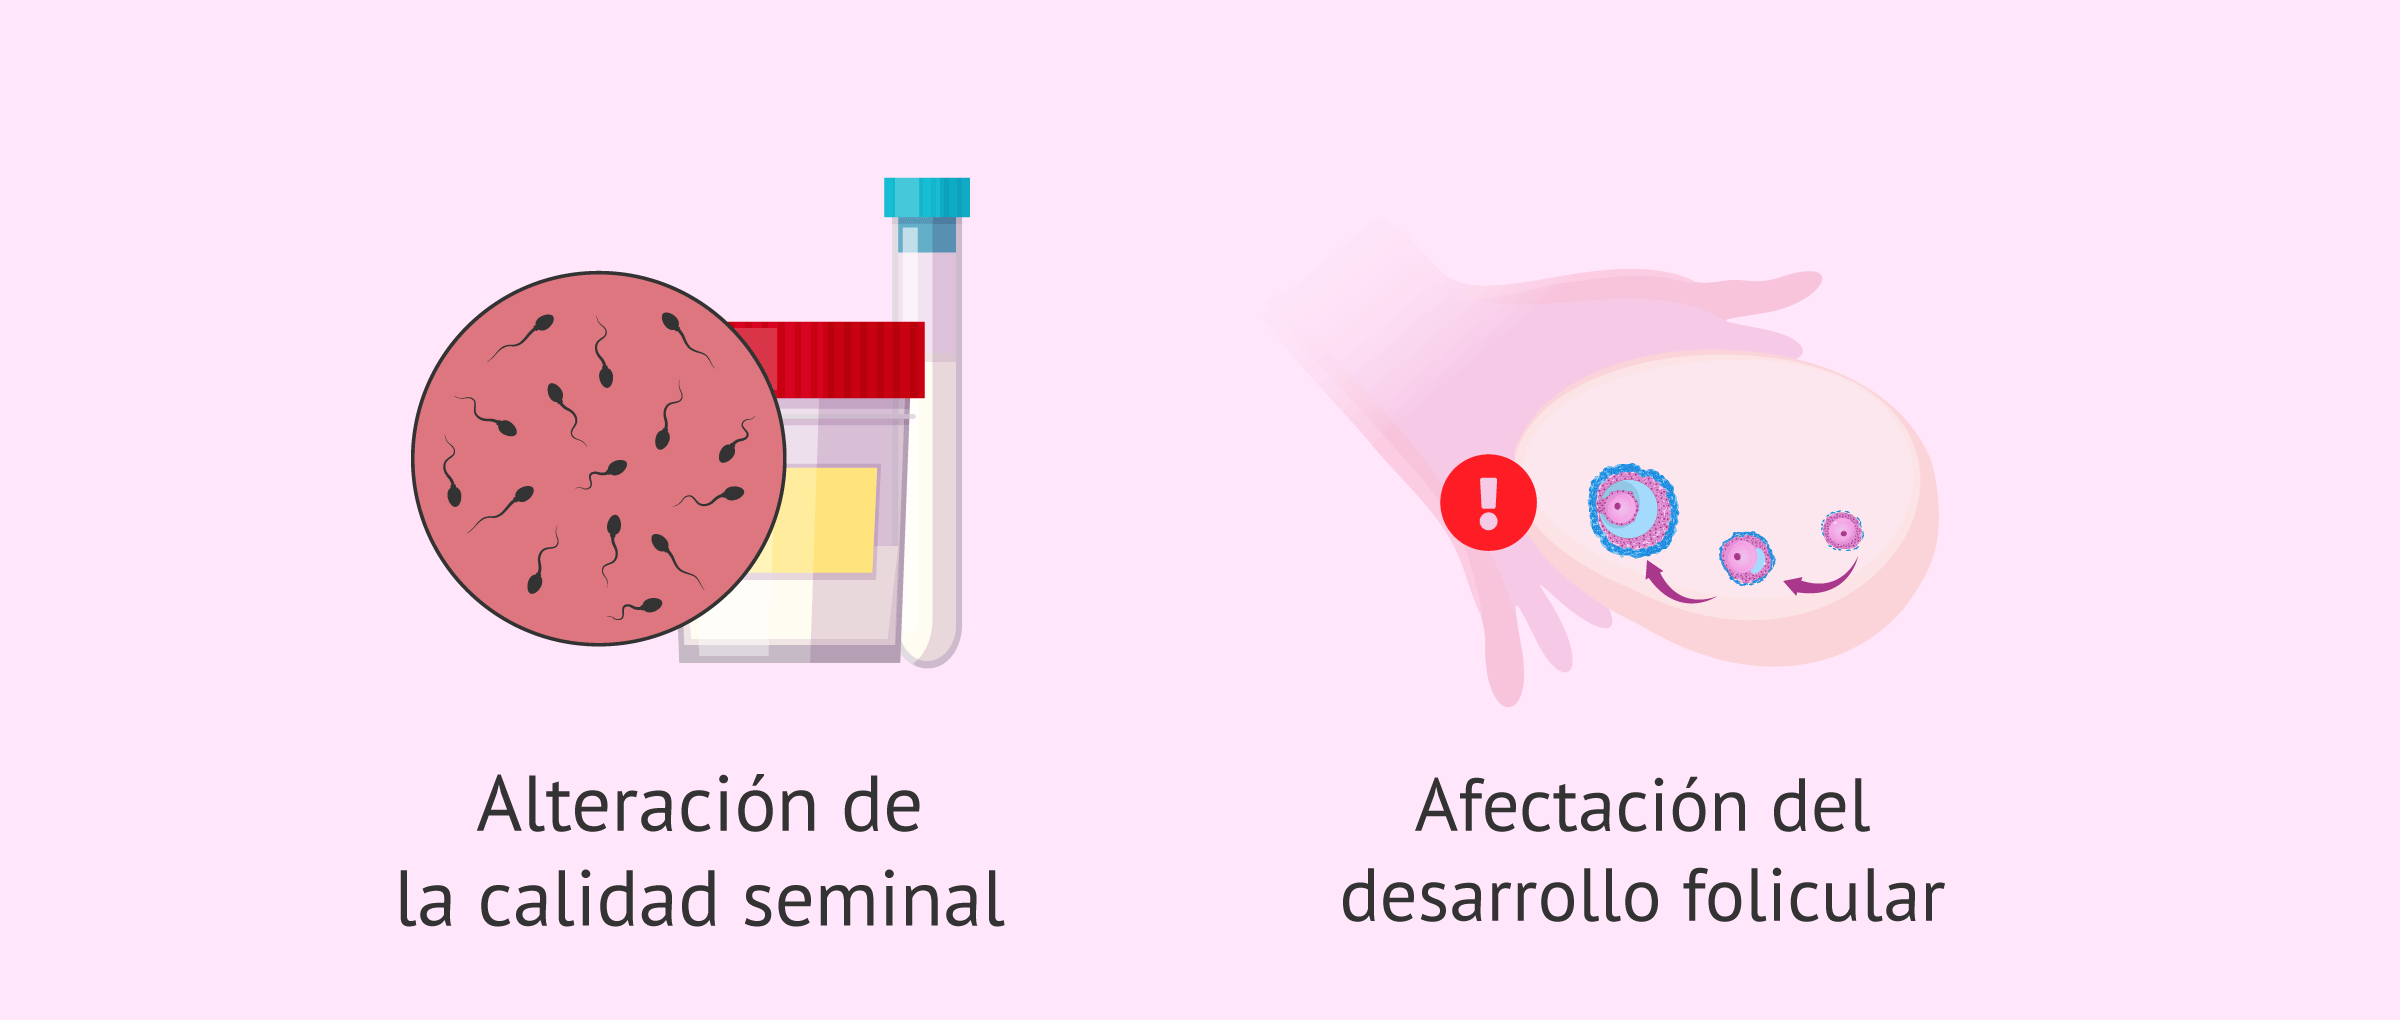 Microbiota y gametogénesis